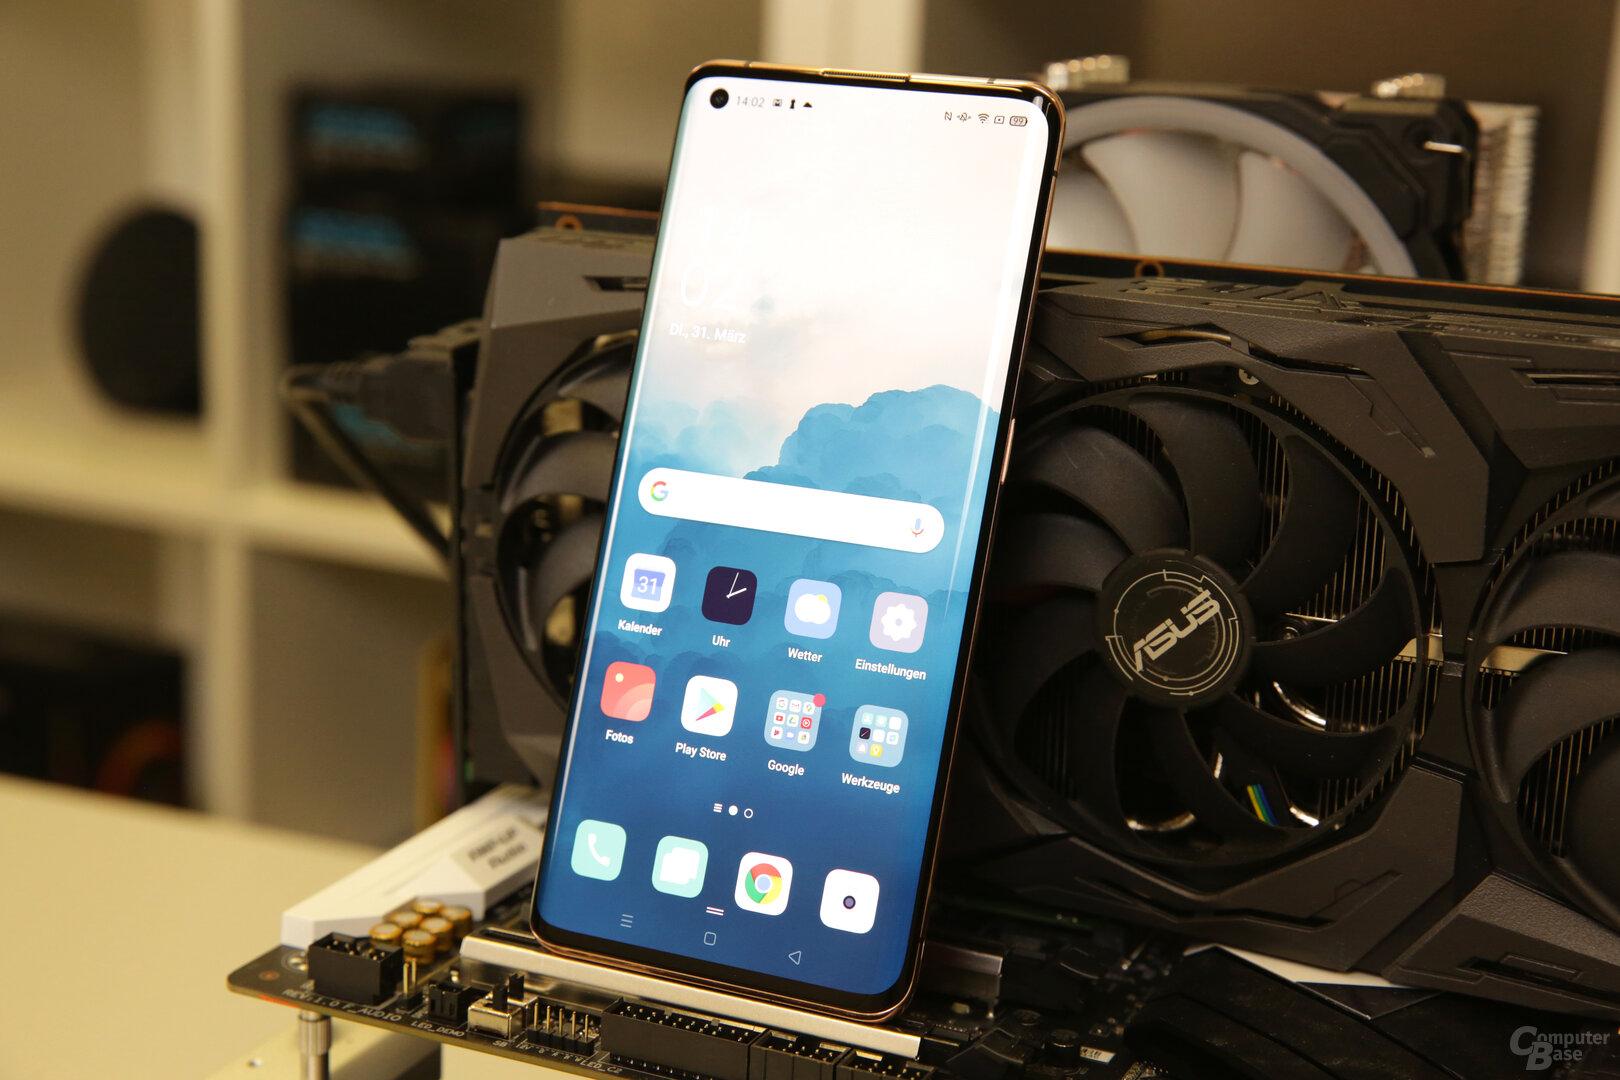 6,7Zol großes OLED-Display mit 1440p bei 120Hz